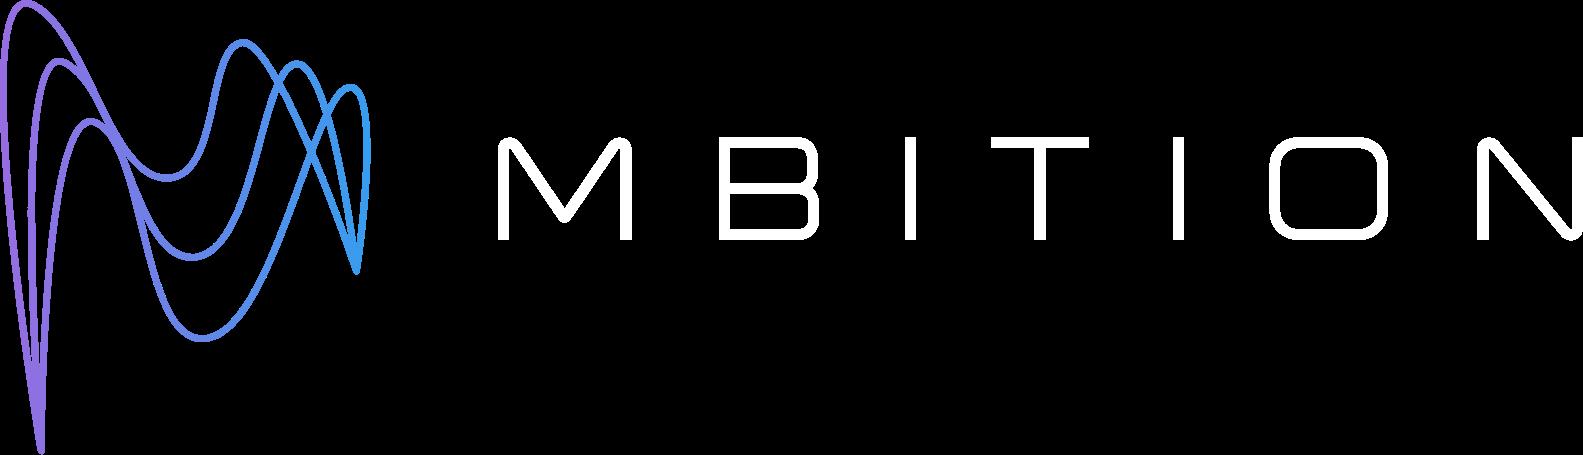 logo mbition mercedes-benz